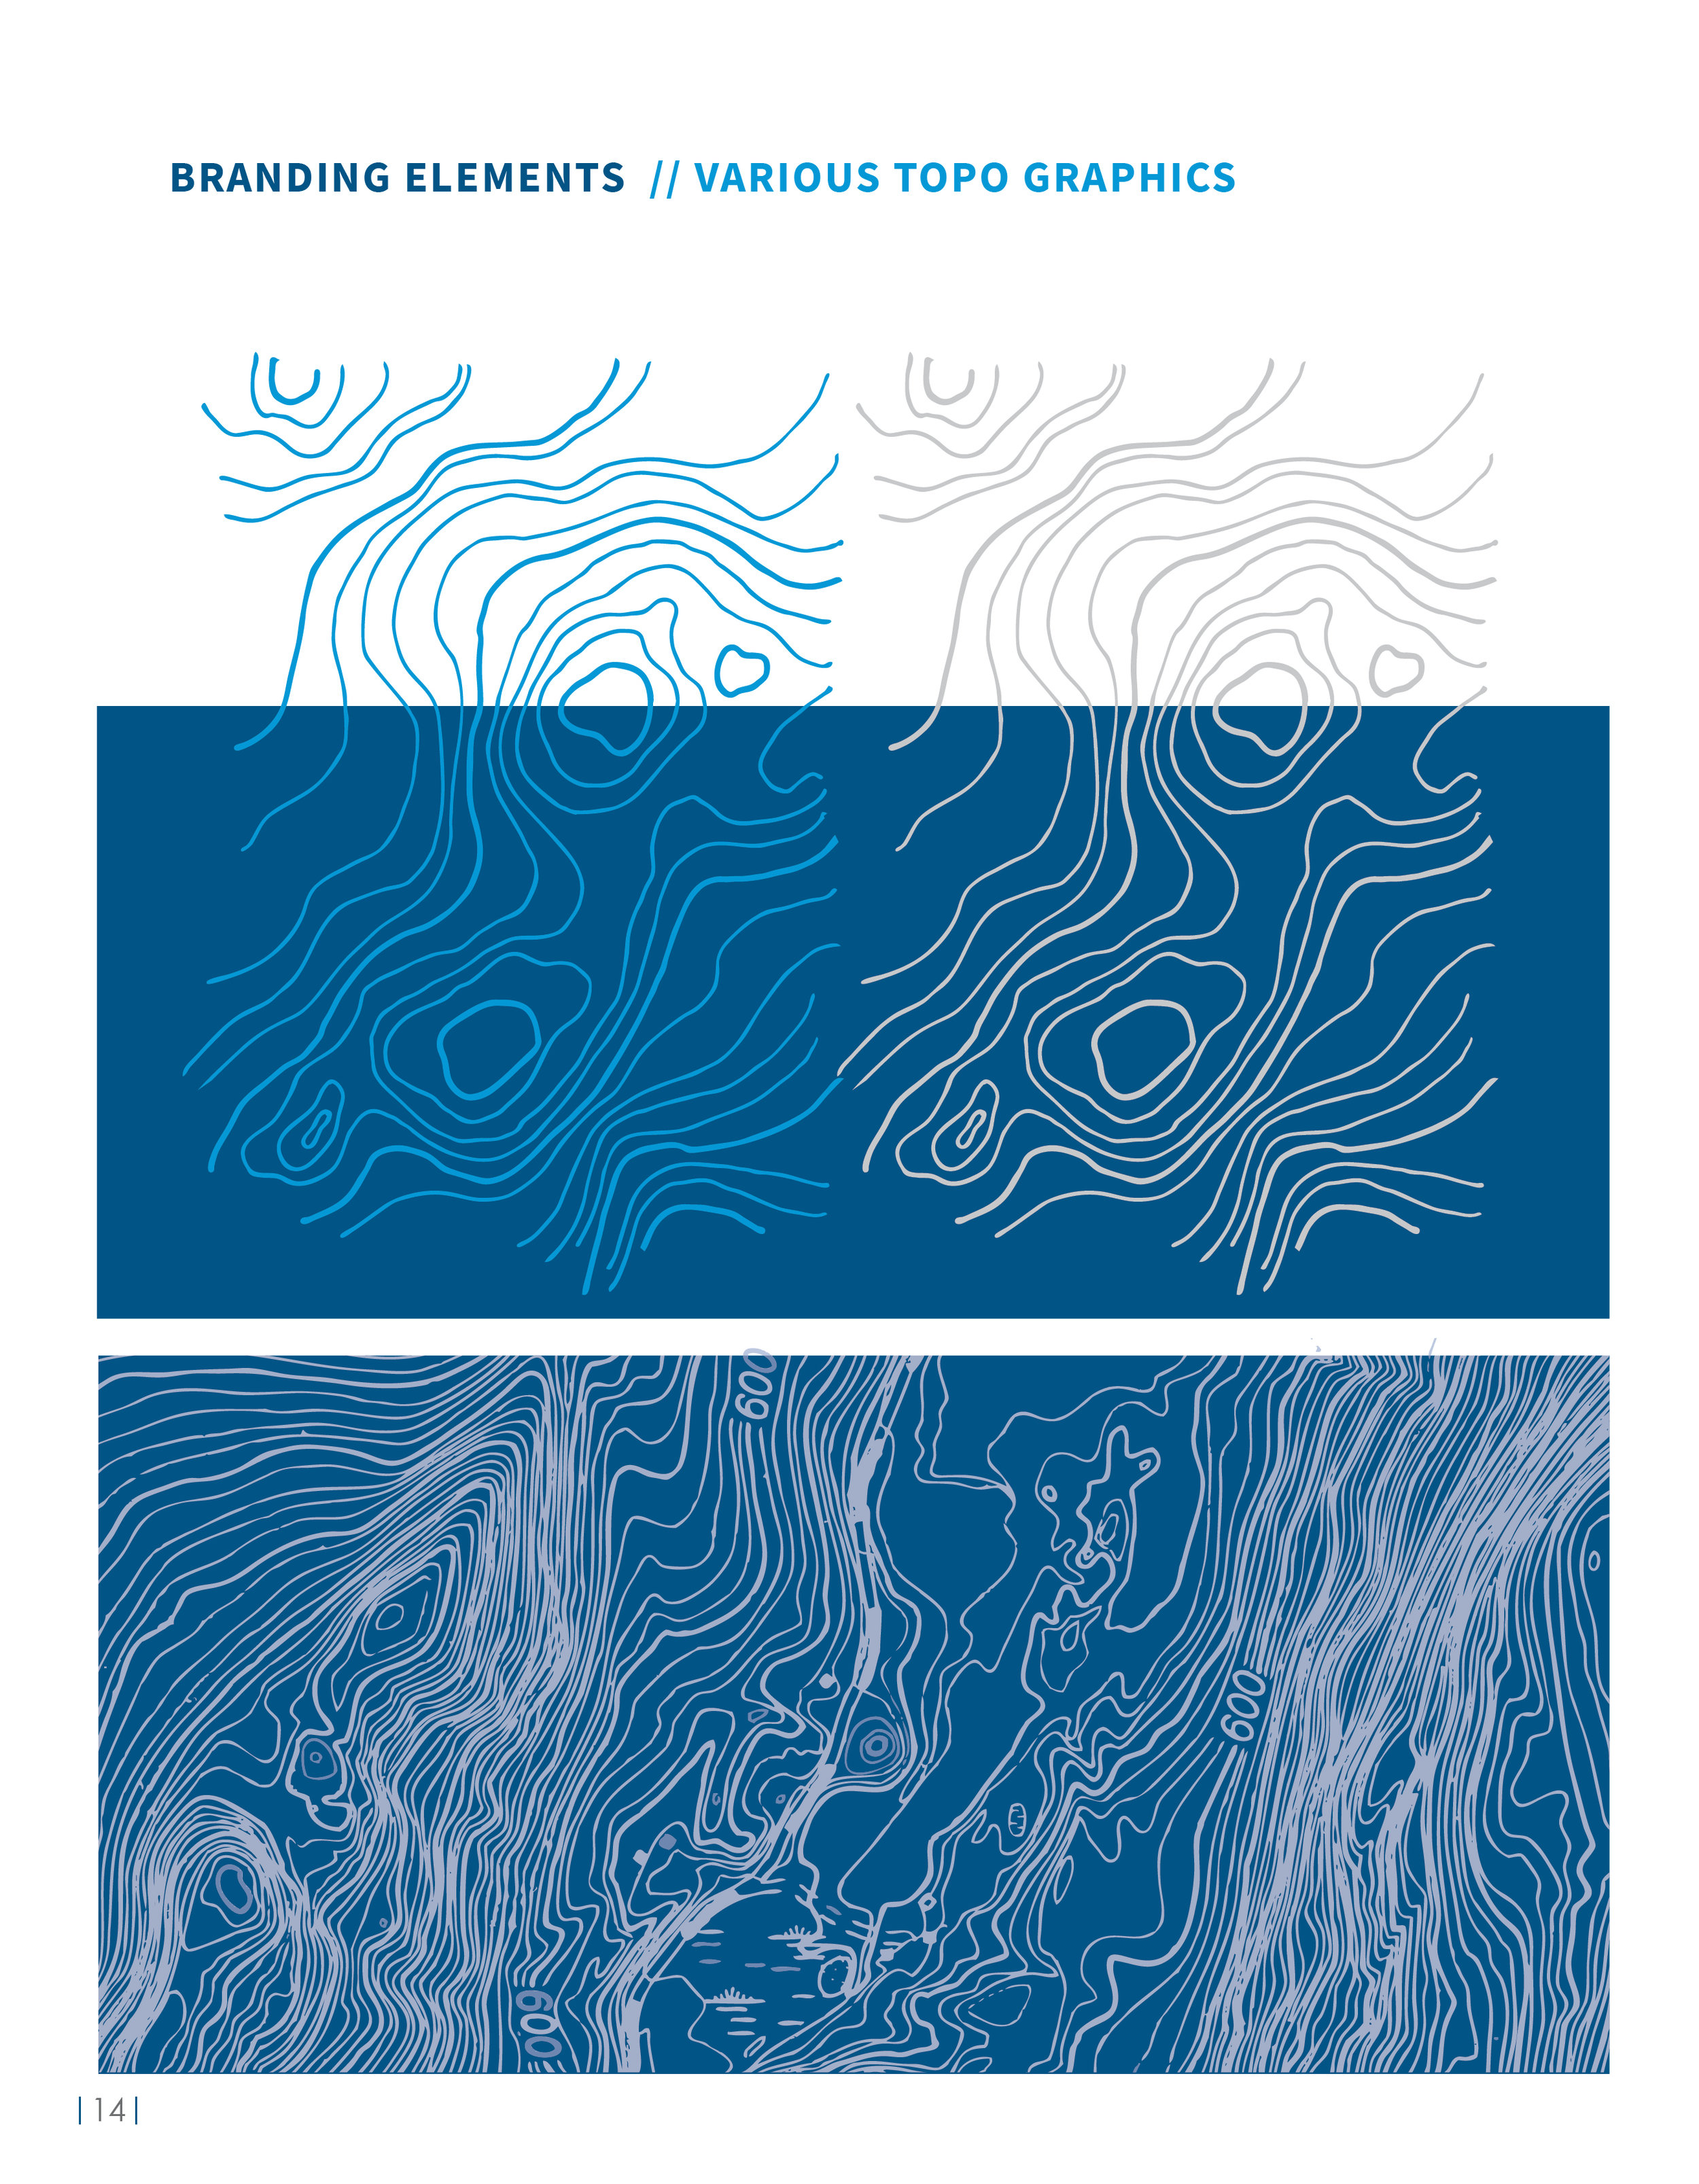 apparel-company-brand-guidelines-design-by-jordan-fretz-design-114.jpg